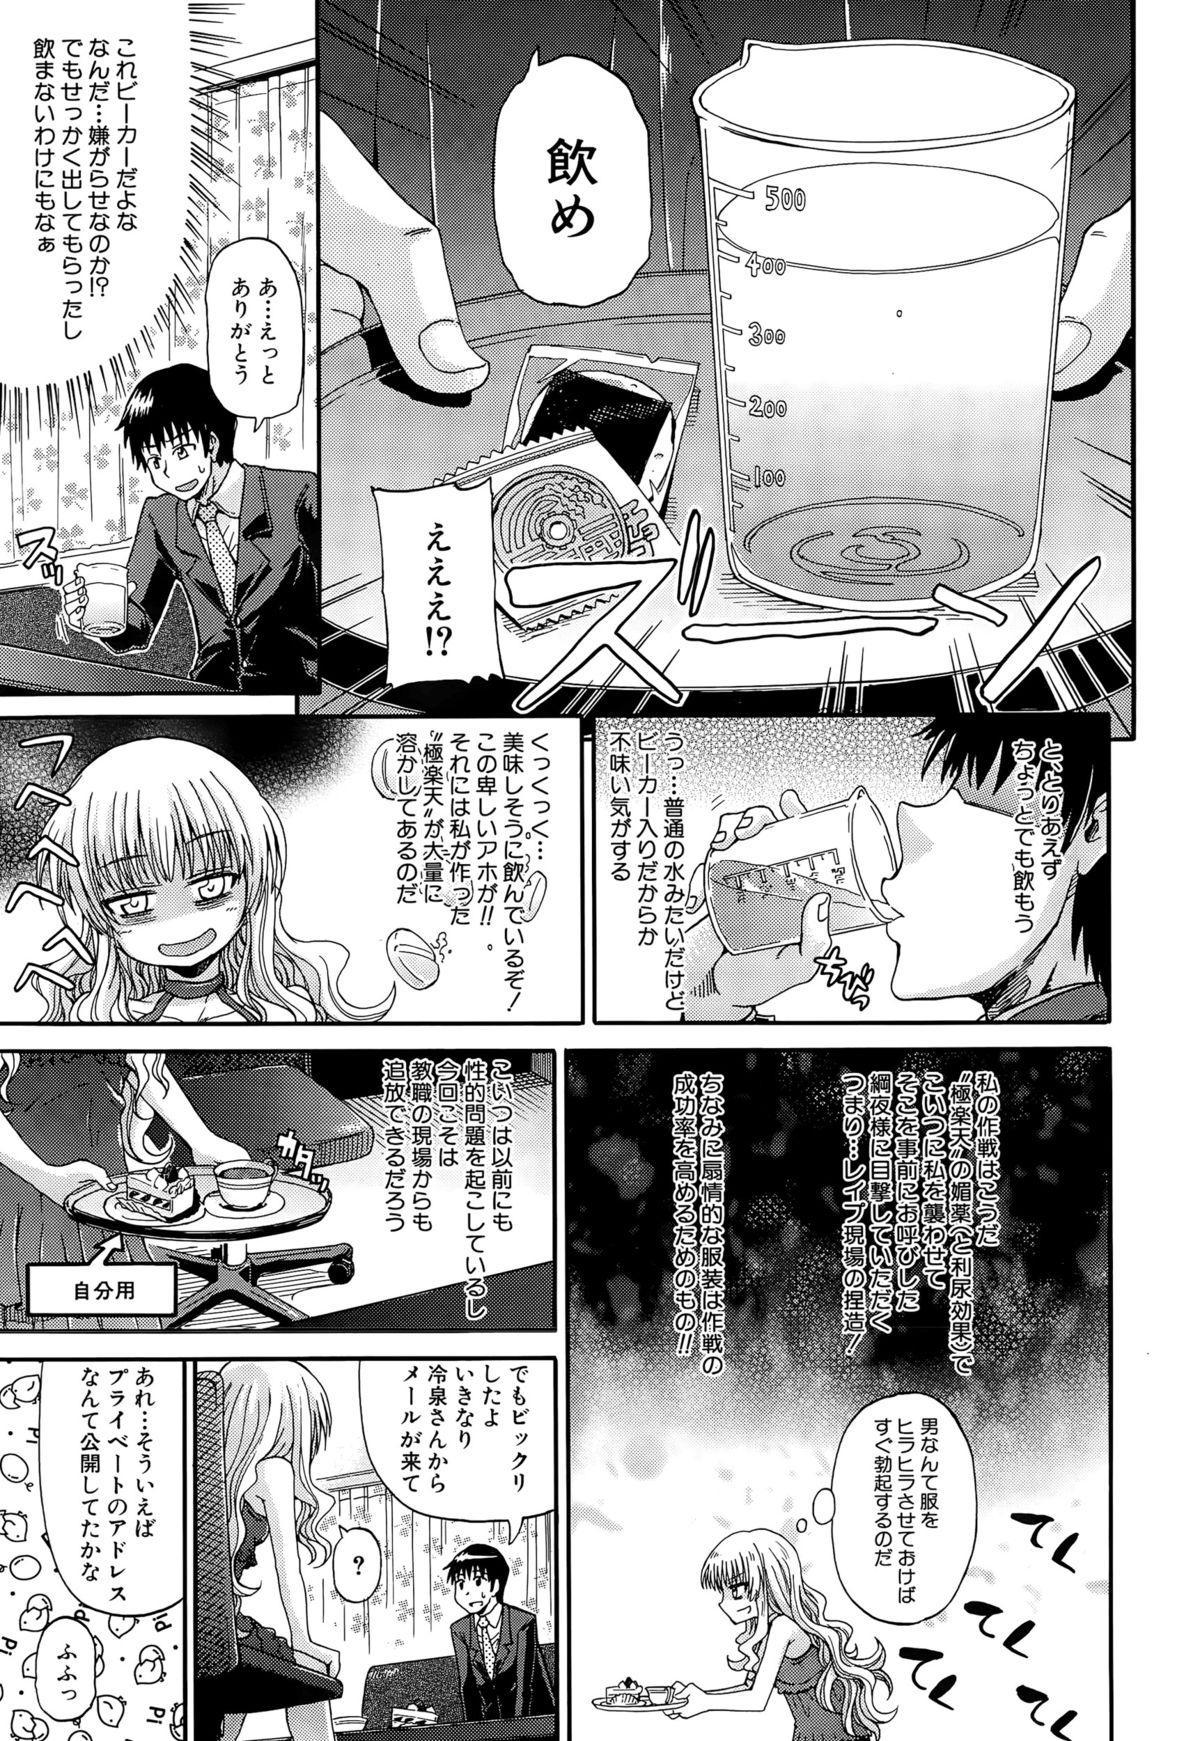 Shousui Awaremi!! Ch. 1-4 76